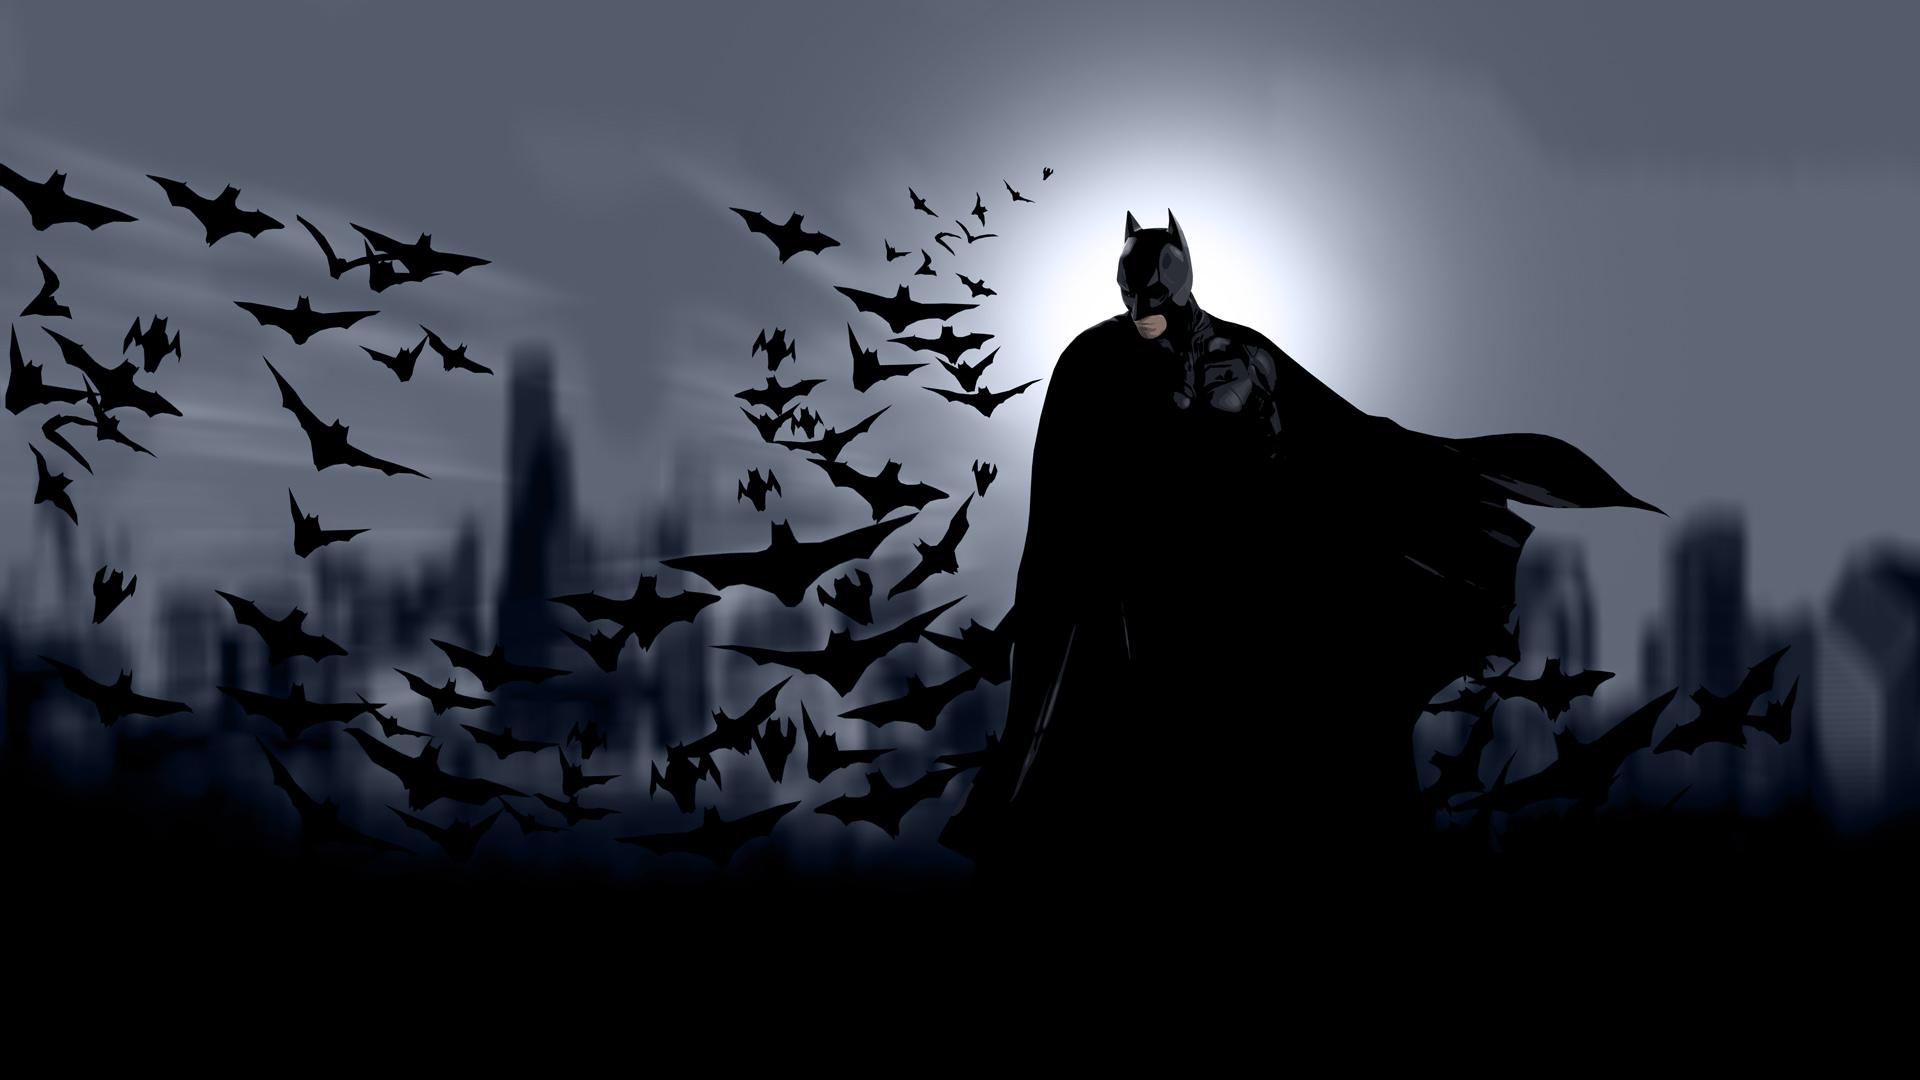 Free Download Batman Begins Wallpaper 1920x1080 For Your